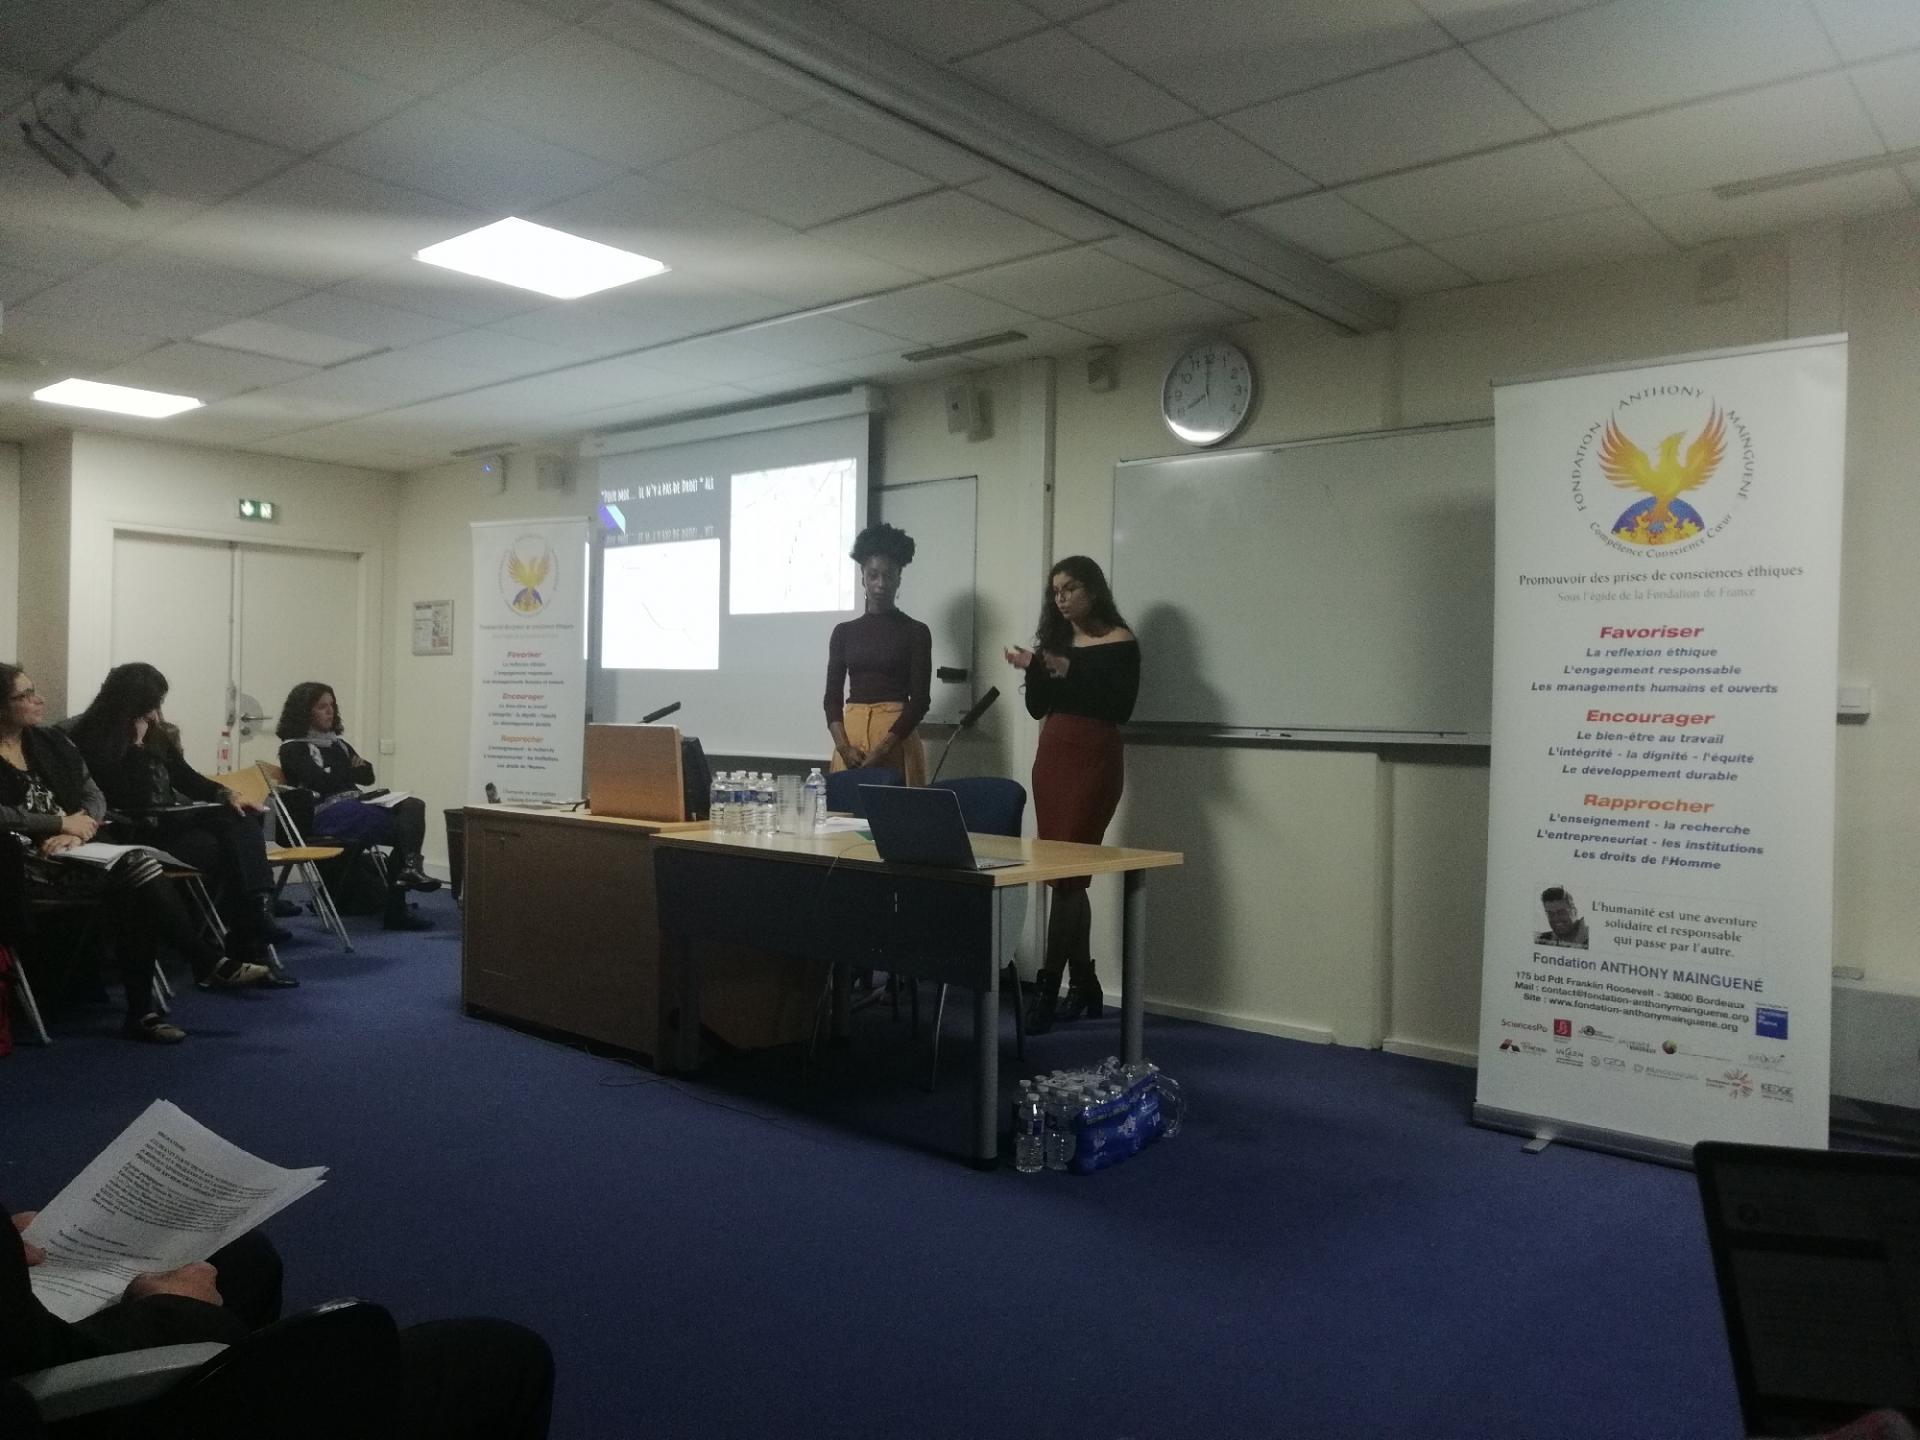 Presentation projet street law